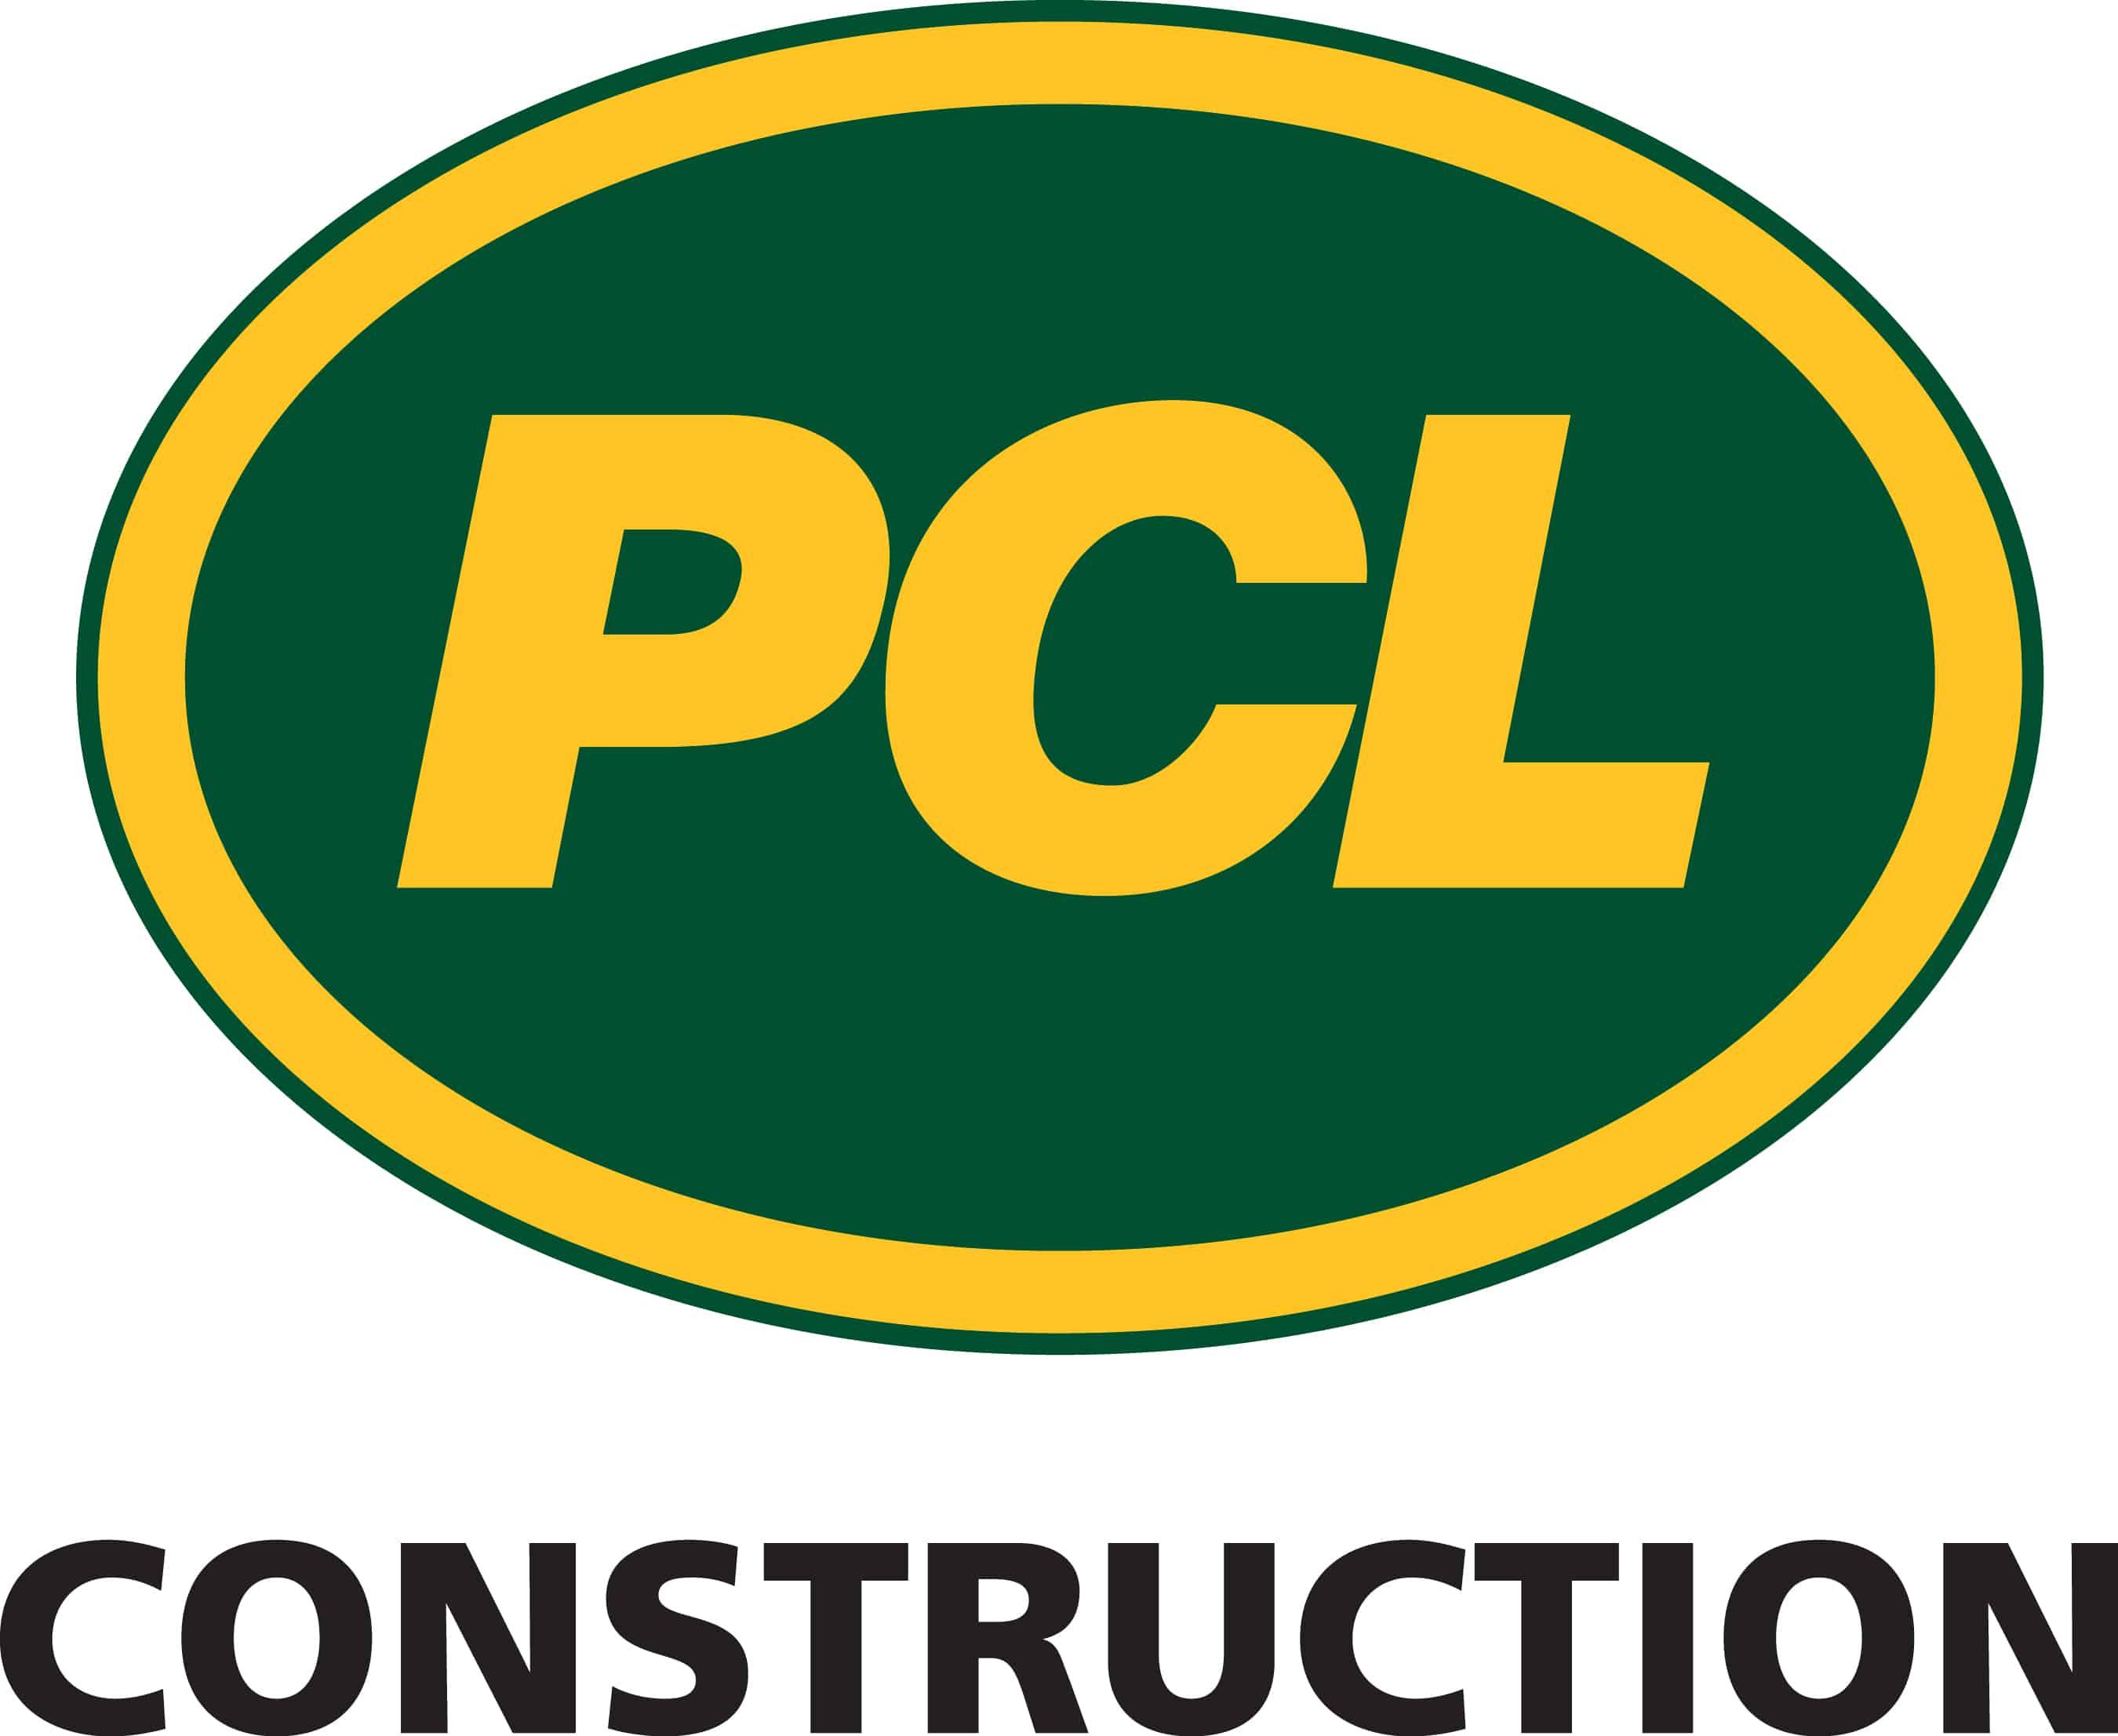 PCL Construction company name